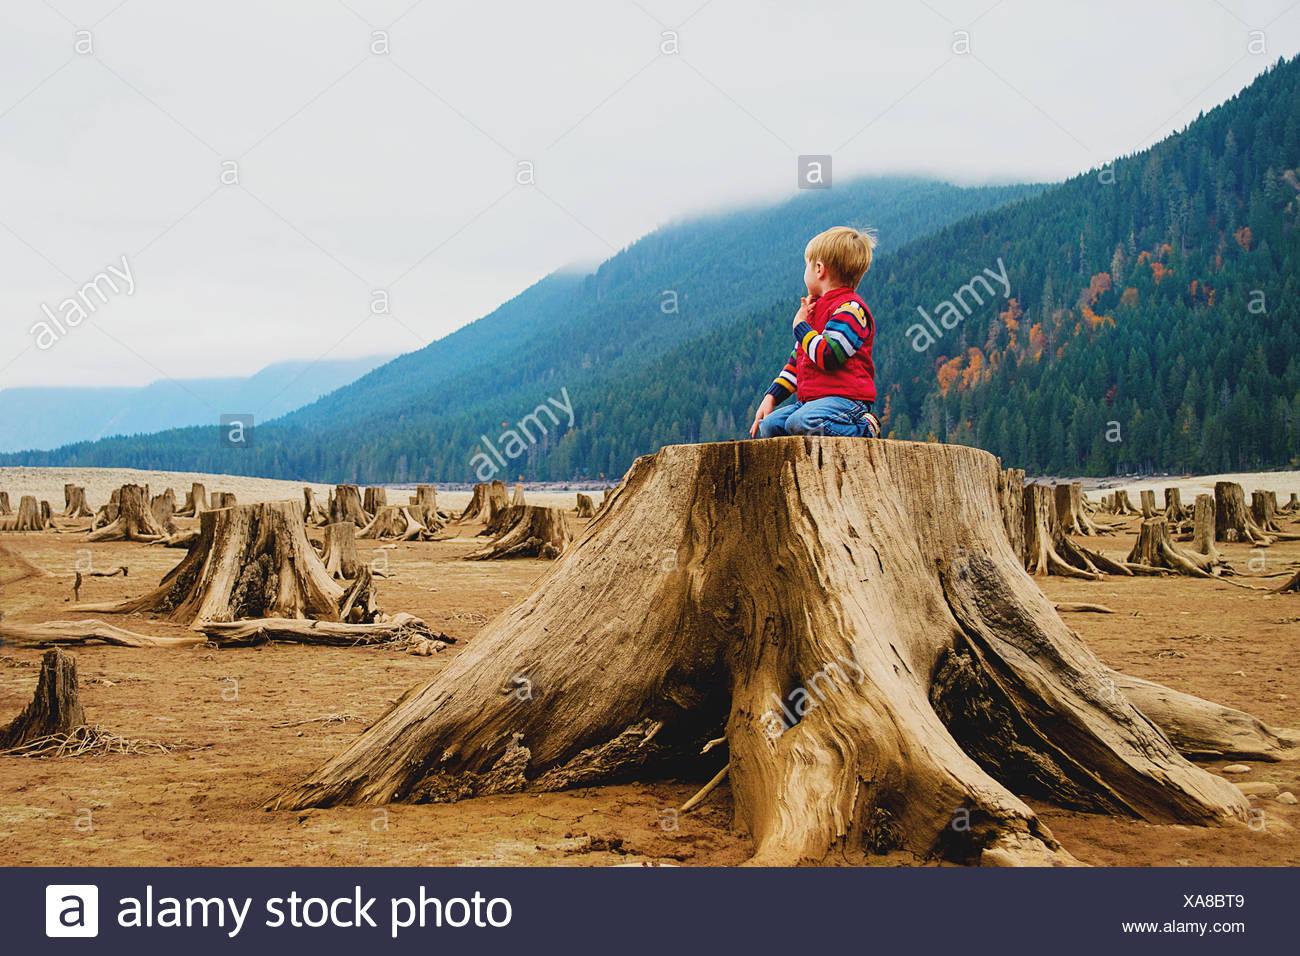 Boy (4-5) kneeling on tree stump - Stock Image